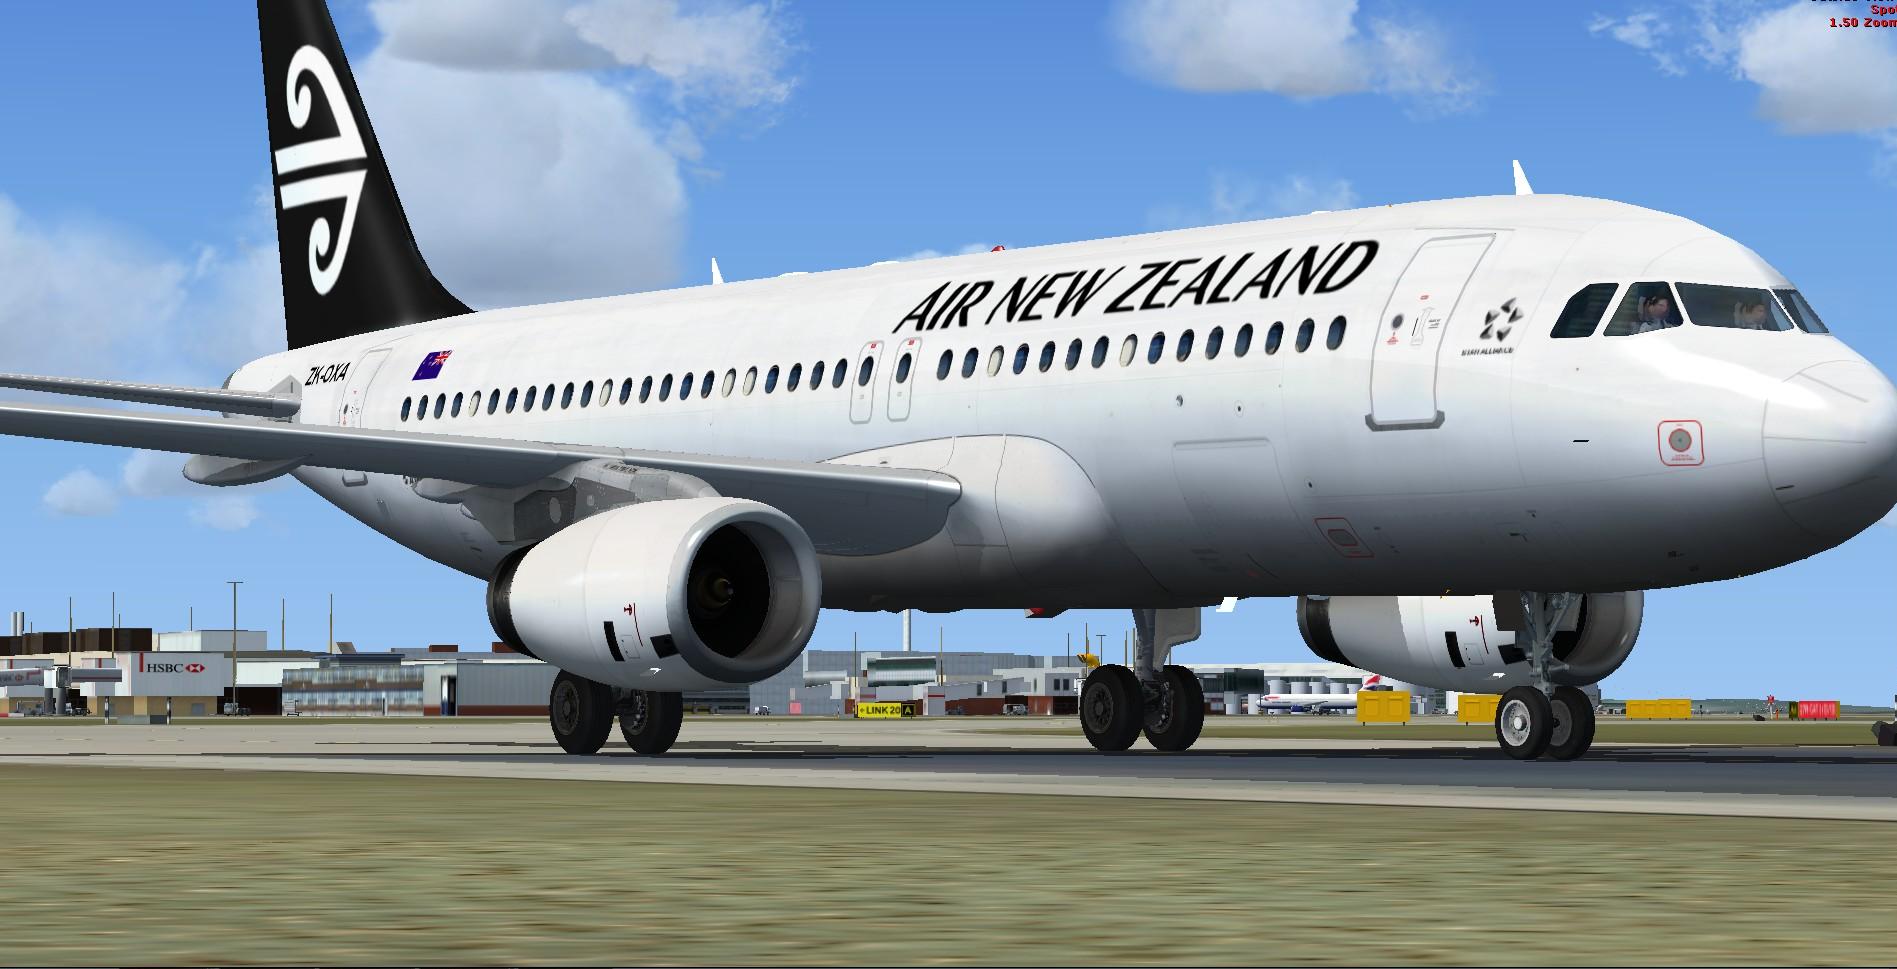 fs-freeware net - FSX Airbus A320-200 Air New Zealand